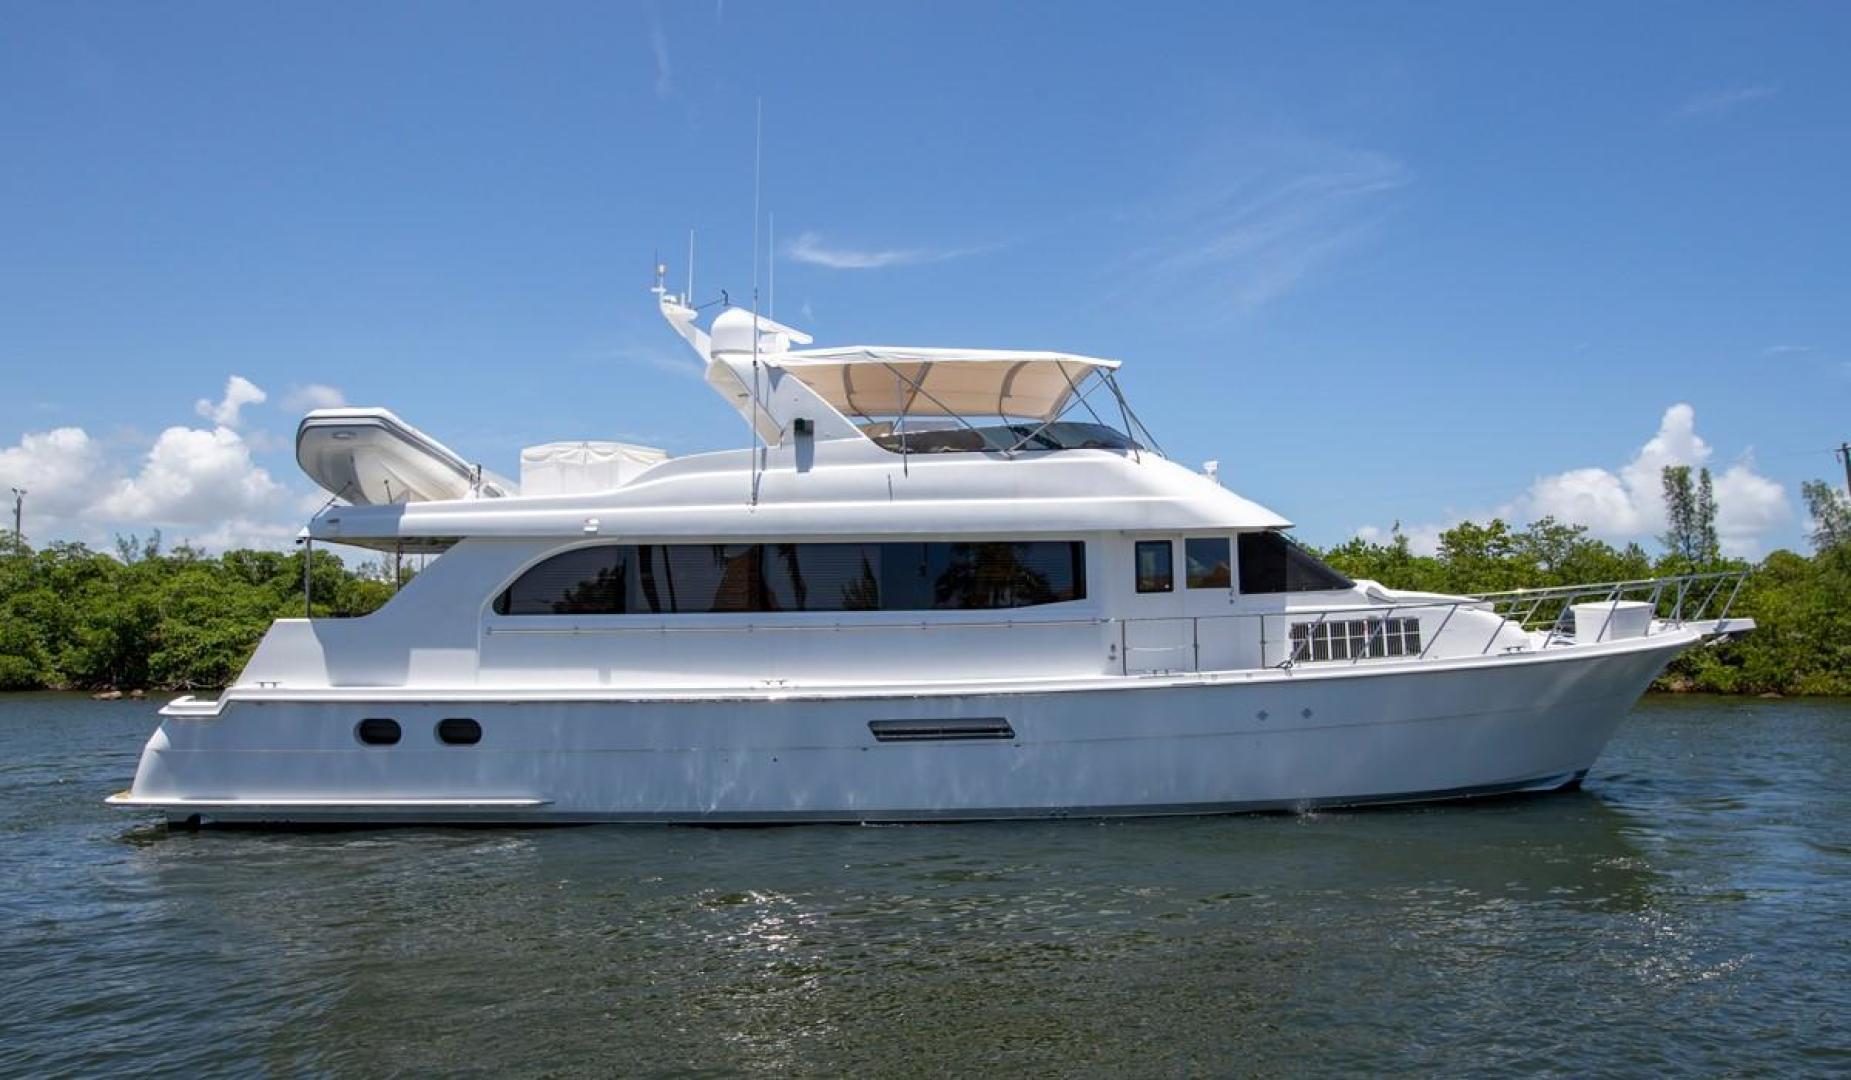 Hatteras-Cockpit Motor Yacht 2000-Getaway Ft. Lauderdale-Florida-United States-977360 | Thumbnail